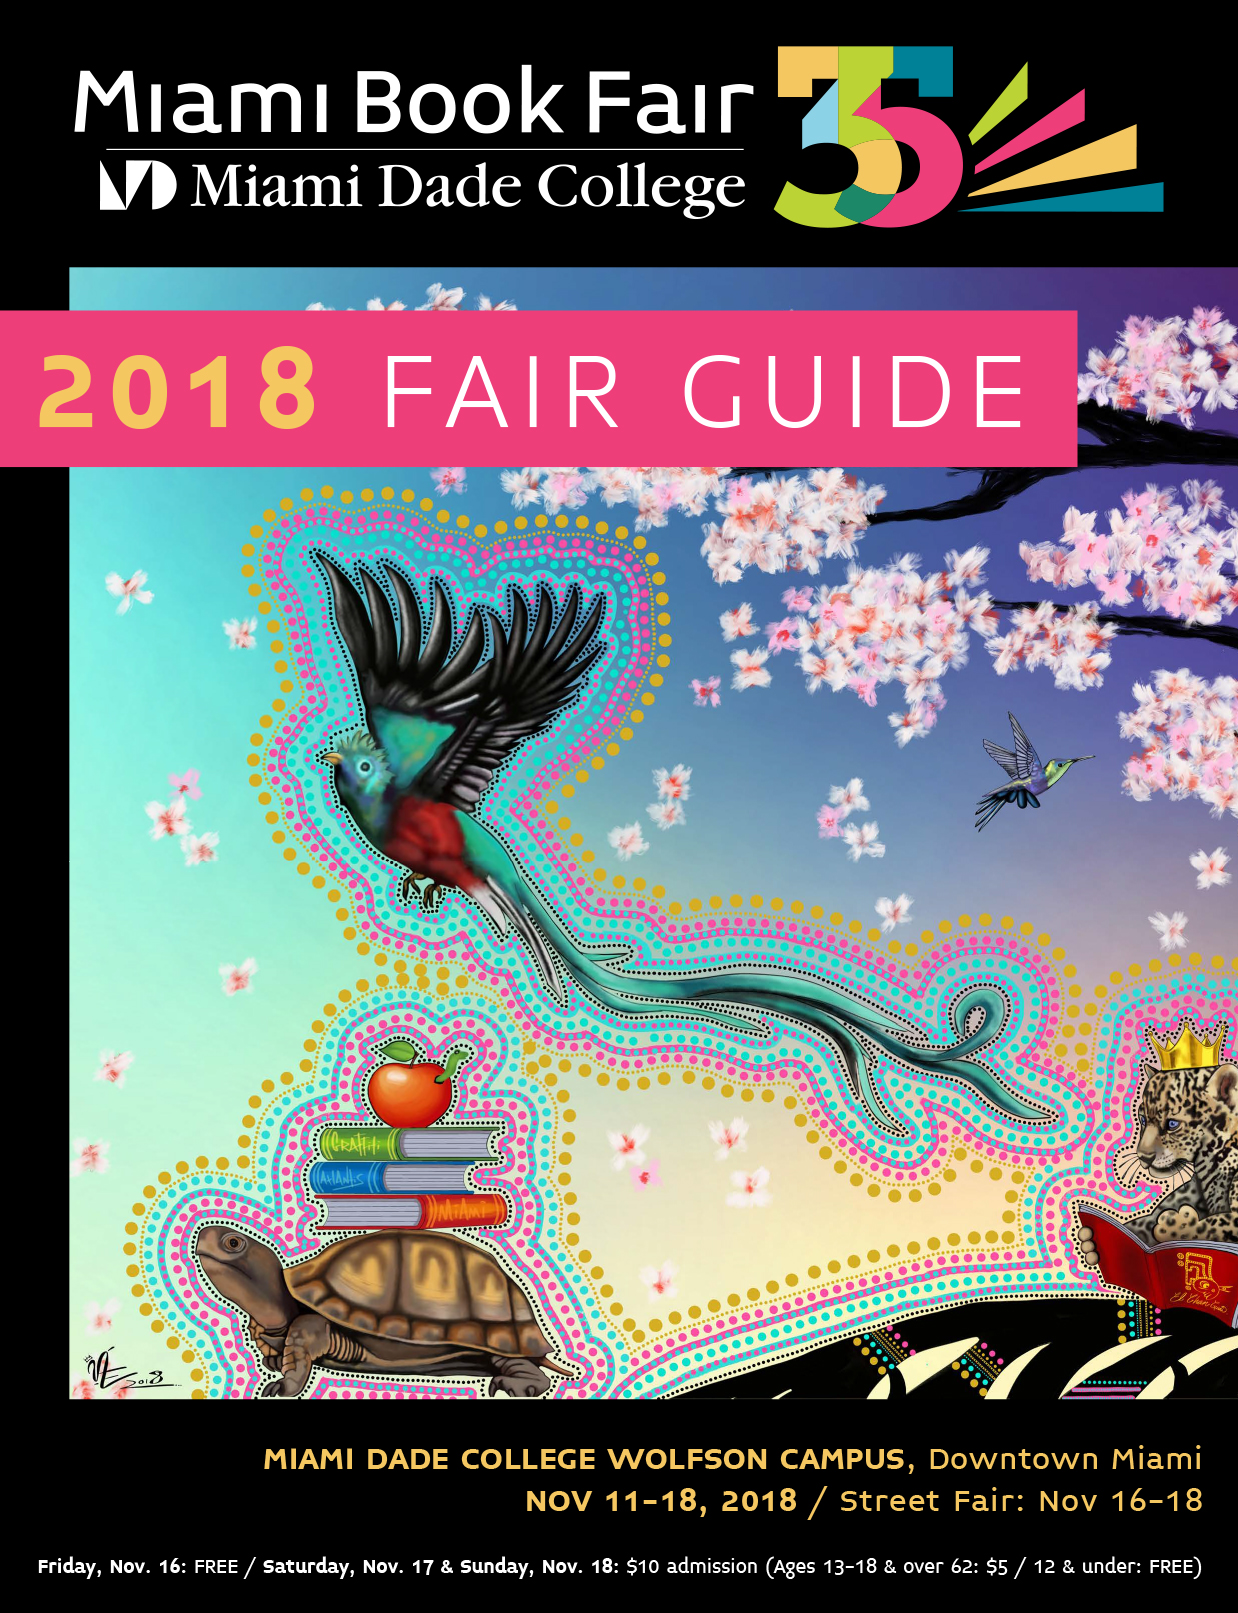 Miami Book Fair Guide Cover. Miami Dade College Wolfson Campus, Downtown Miami. No. 11-18, 2018 / Street Fair: Nov. 16-18. Friday, Nov. 16: FREE, Saturday, Nov. 17 and Sunday, Nov. 18: $10 Admission (Ages 13-18 & over 62: $5 / 12 & under: FREE)